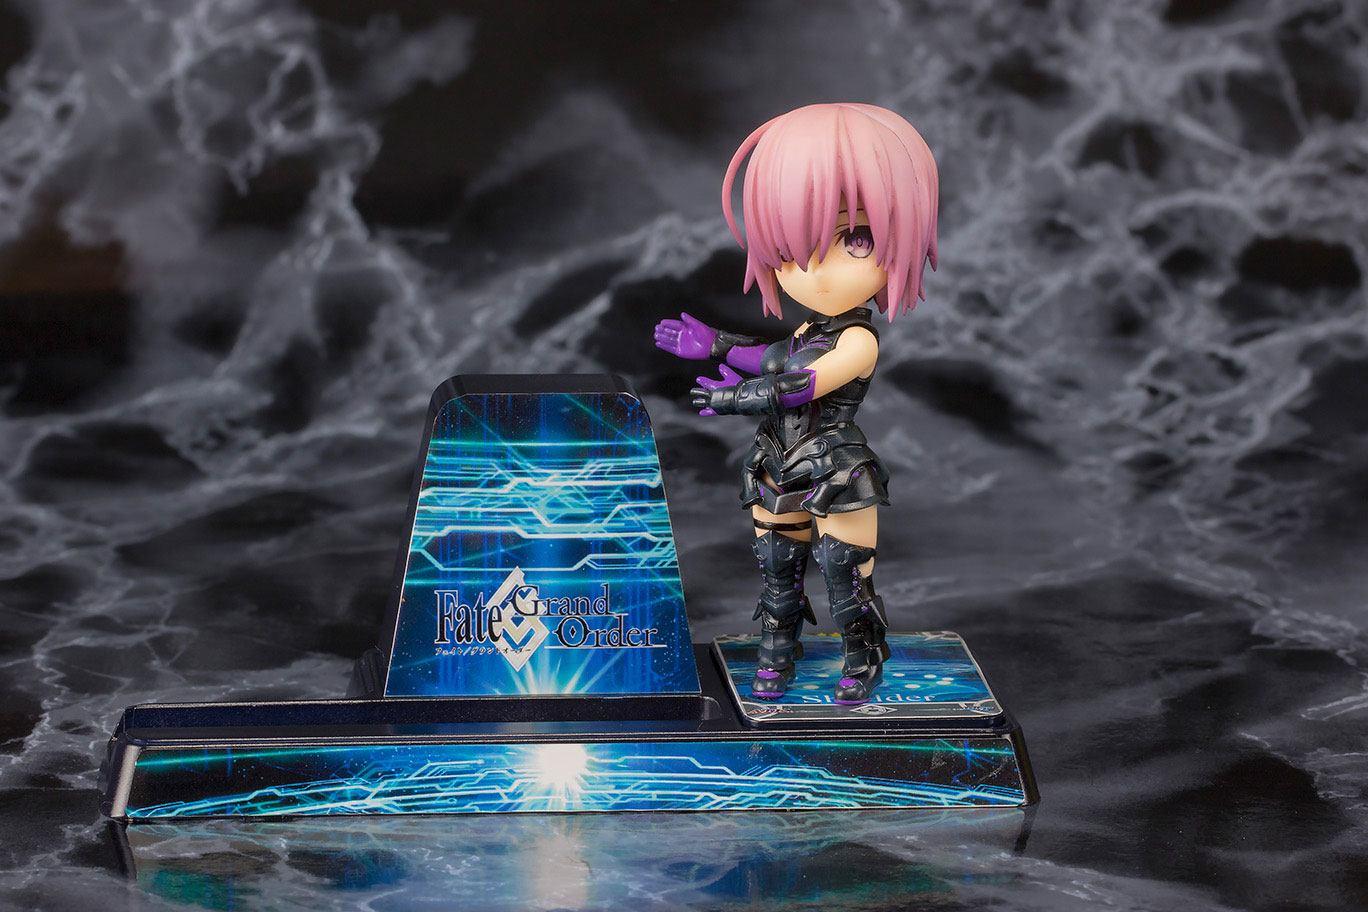 Fate/Grand Order Bishoujo Character Collection Mini Figure Shielder/Mash Kyrielight 8 cm